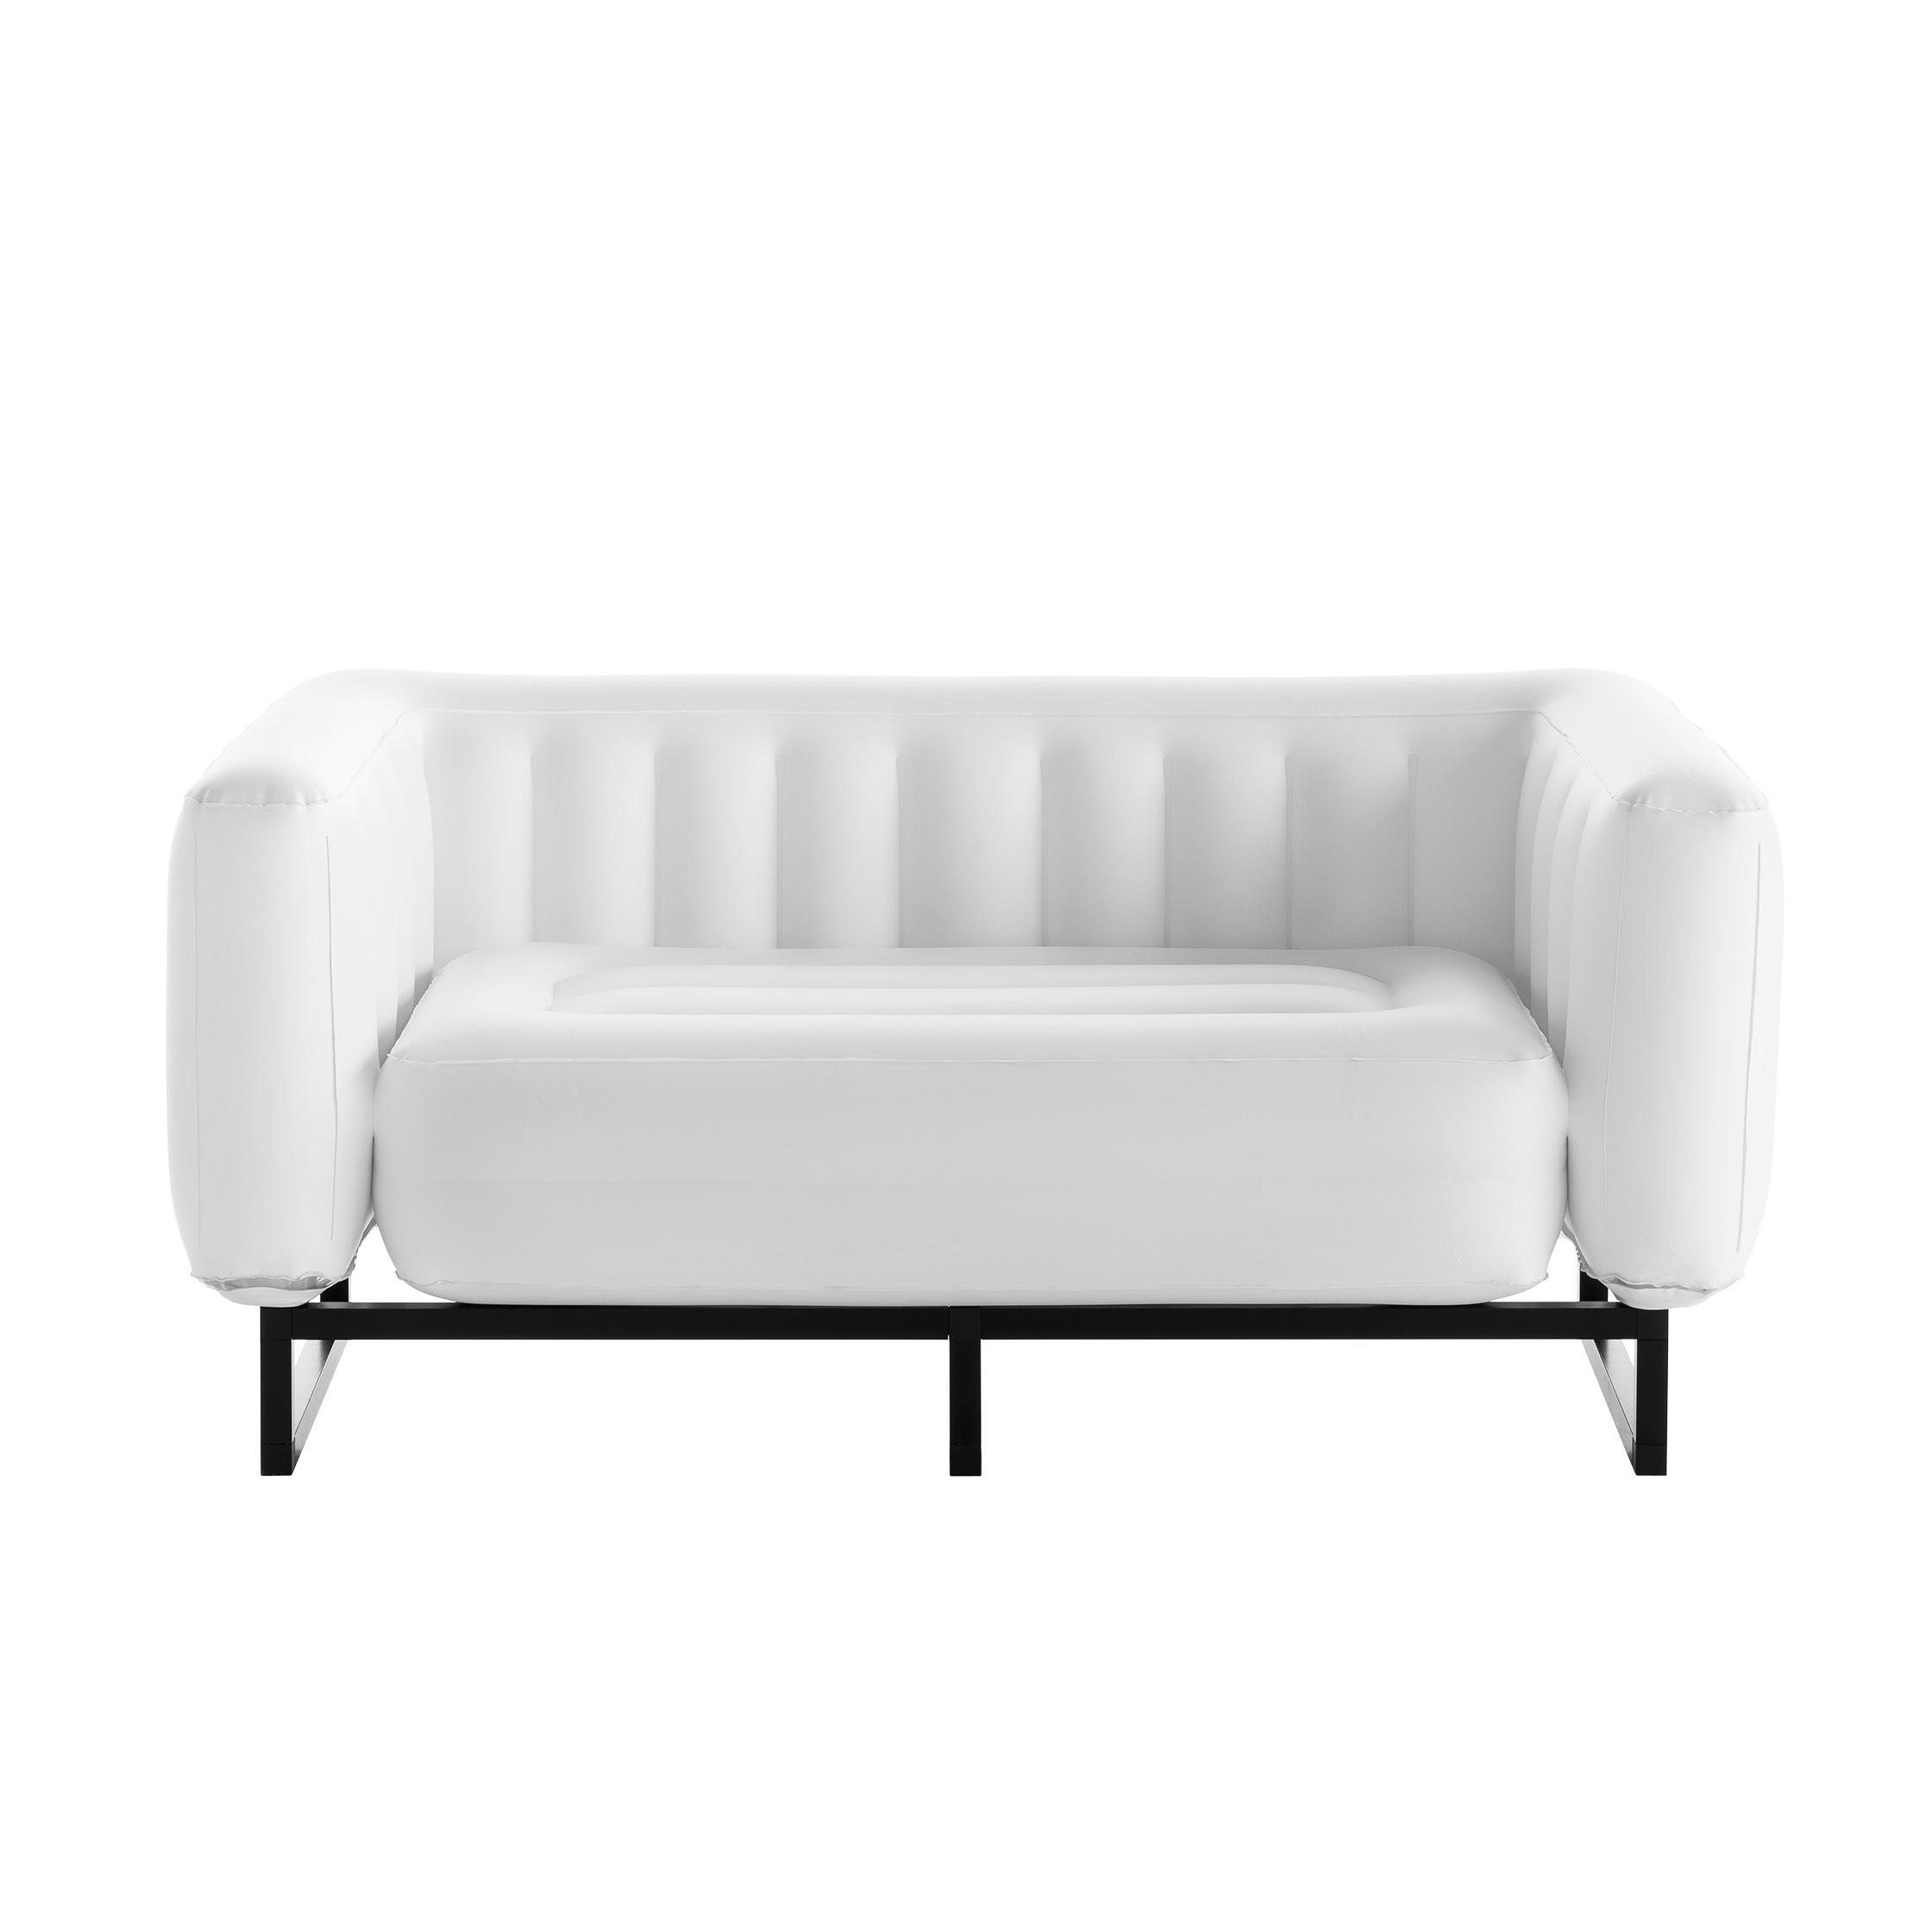 Canapé 2 places pvc blanc cadre en aluminium